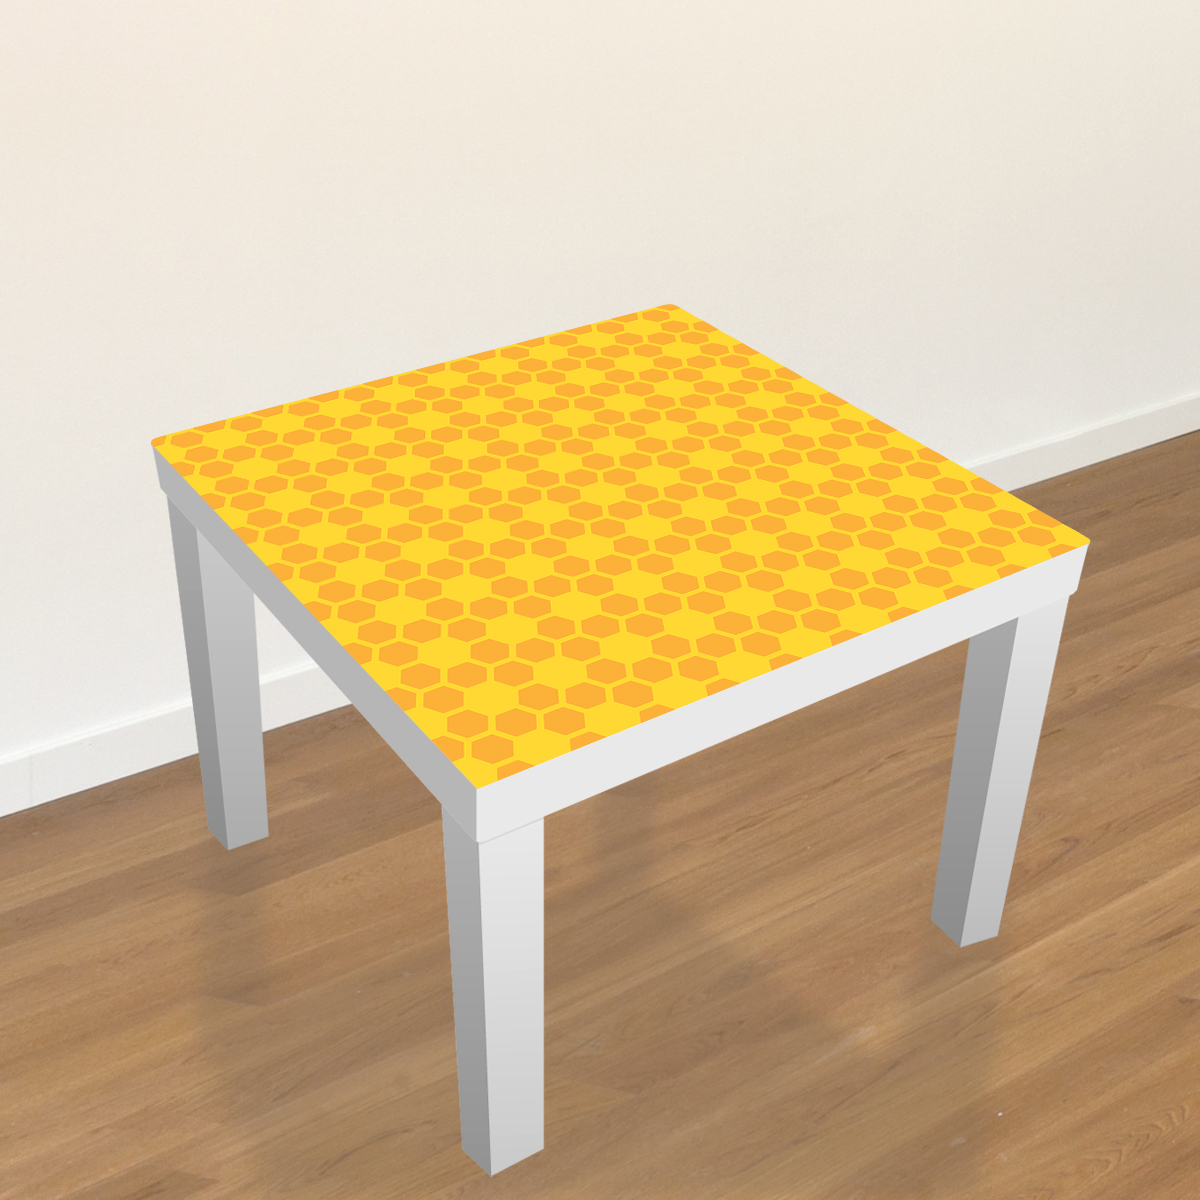 stickers meubles ikea stickers meubles ikea nid d 39 abeilles ambiance. Black Bedroom Furniture Sets. Home Design Ideas